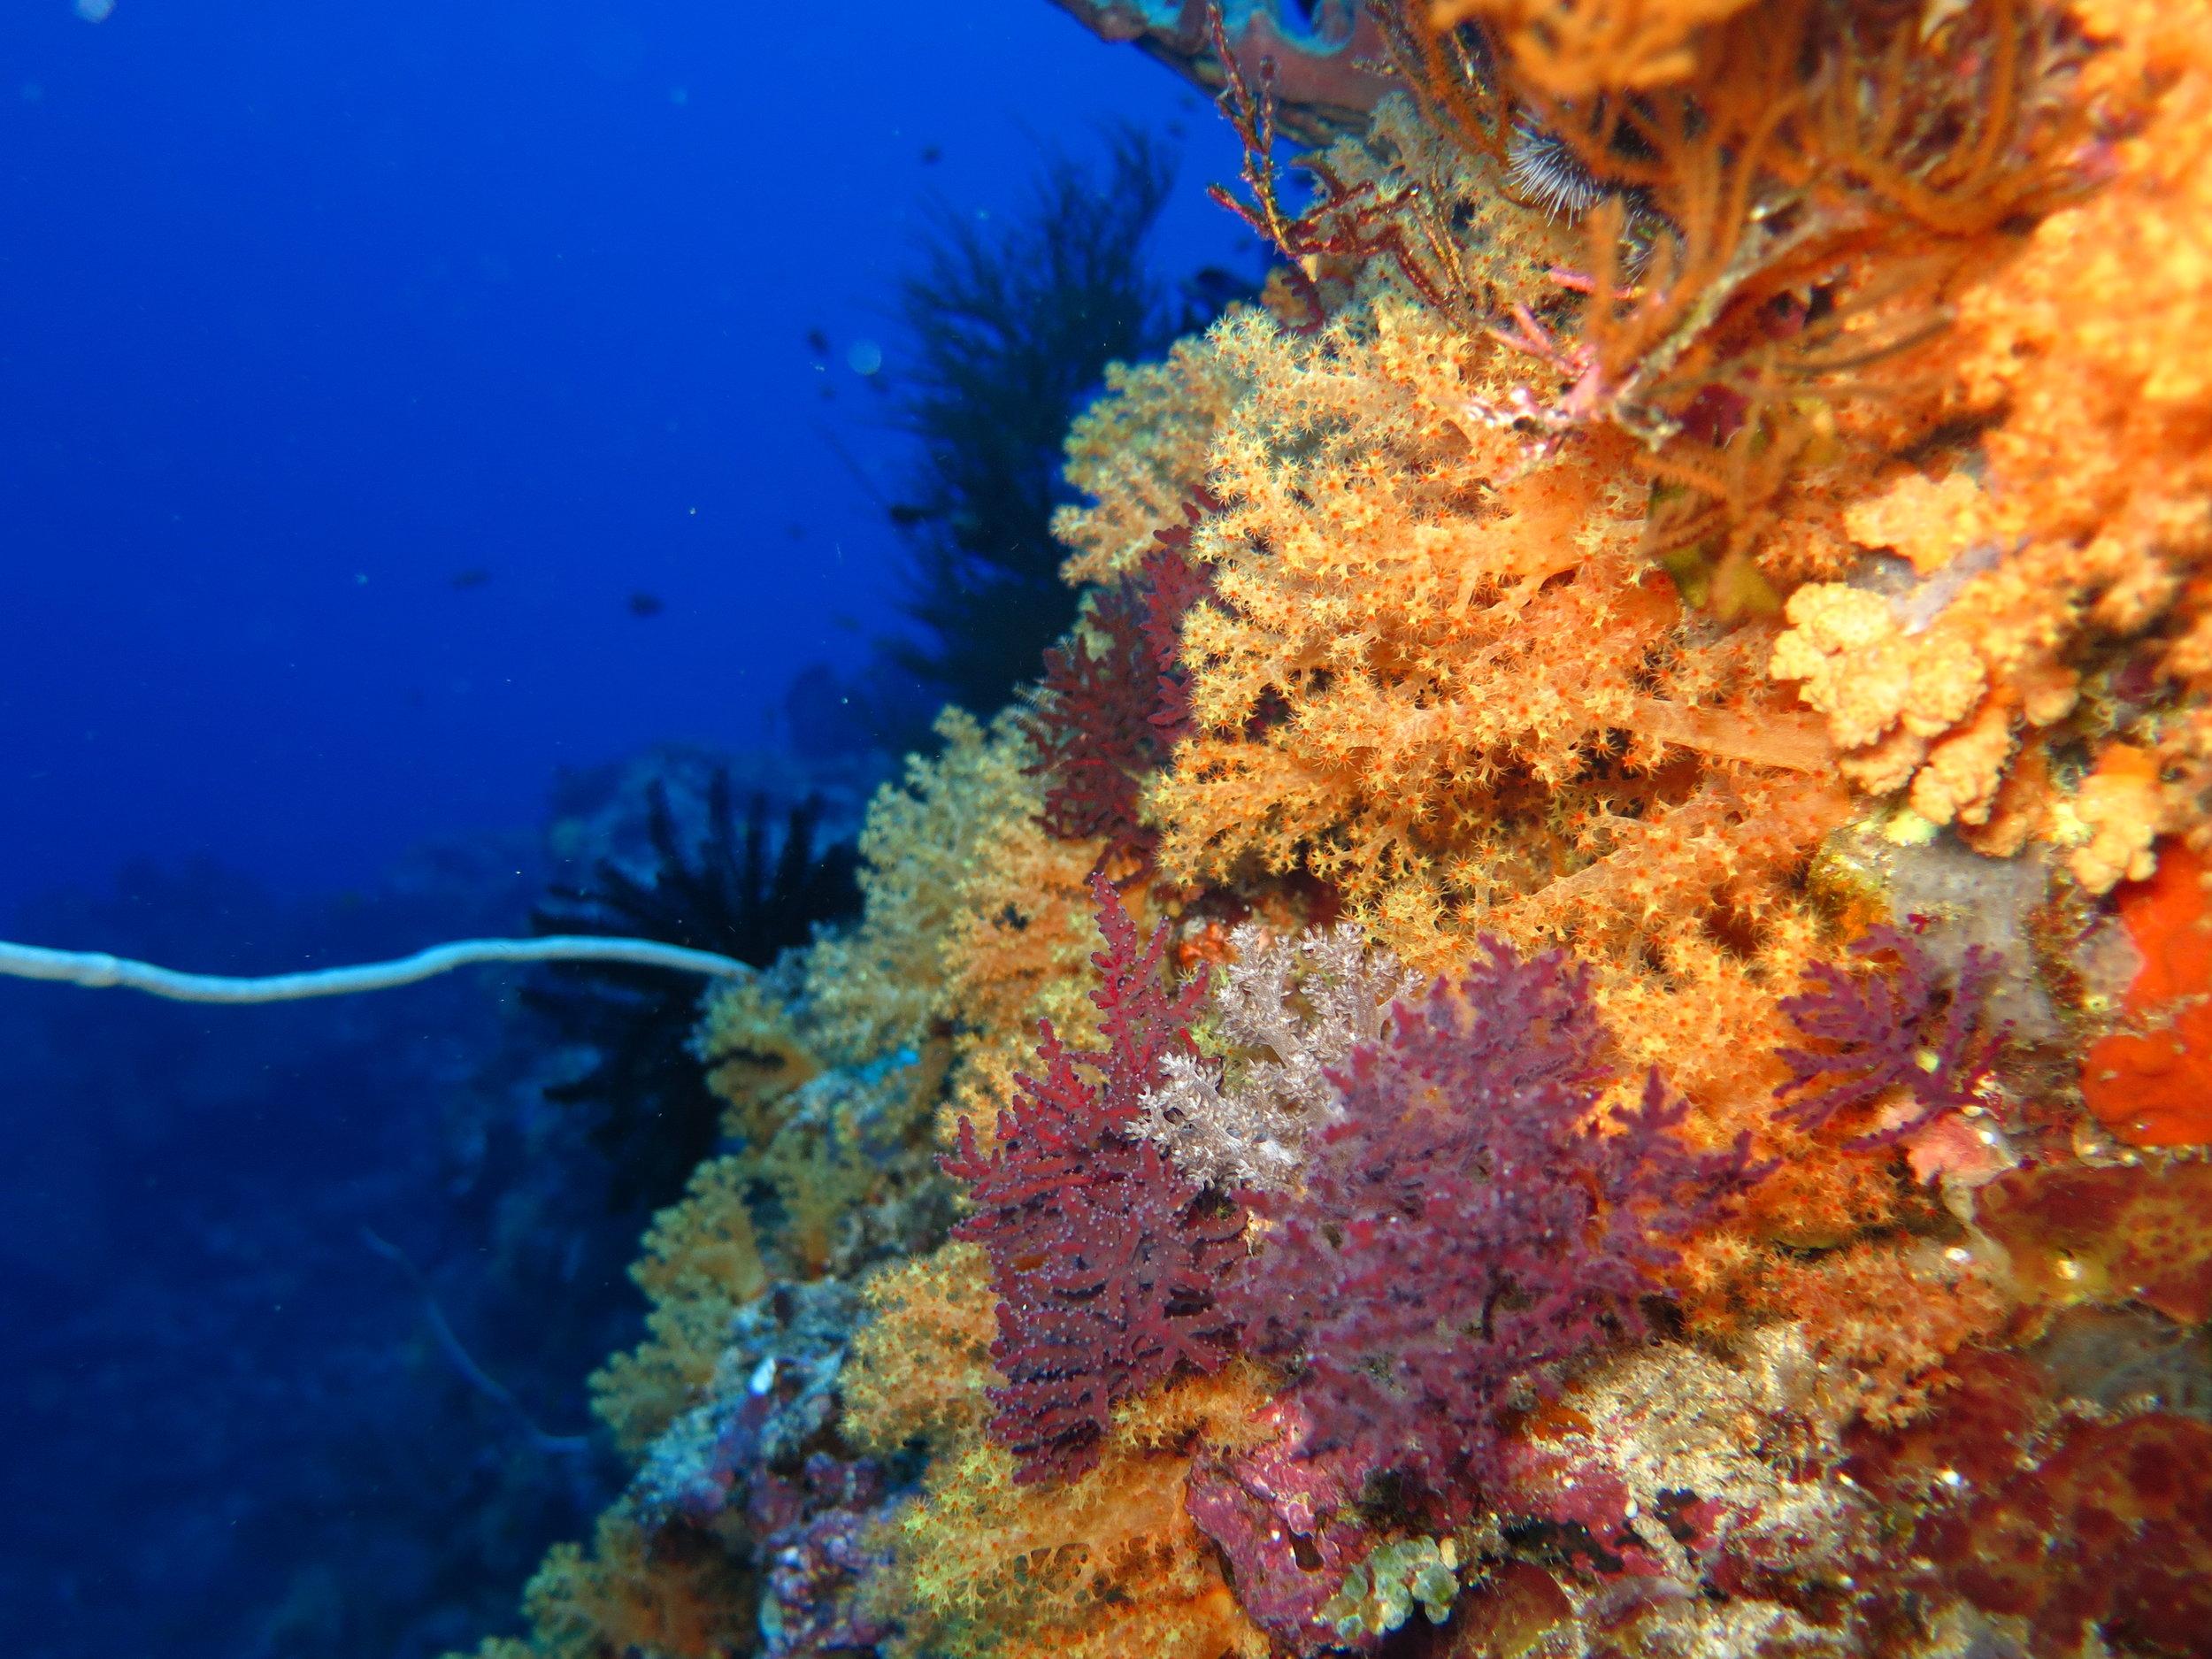 """Diving in Playa del Carmen"" Photo by Steve Willard"